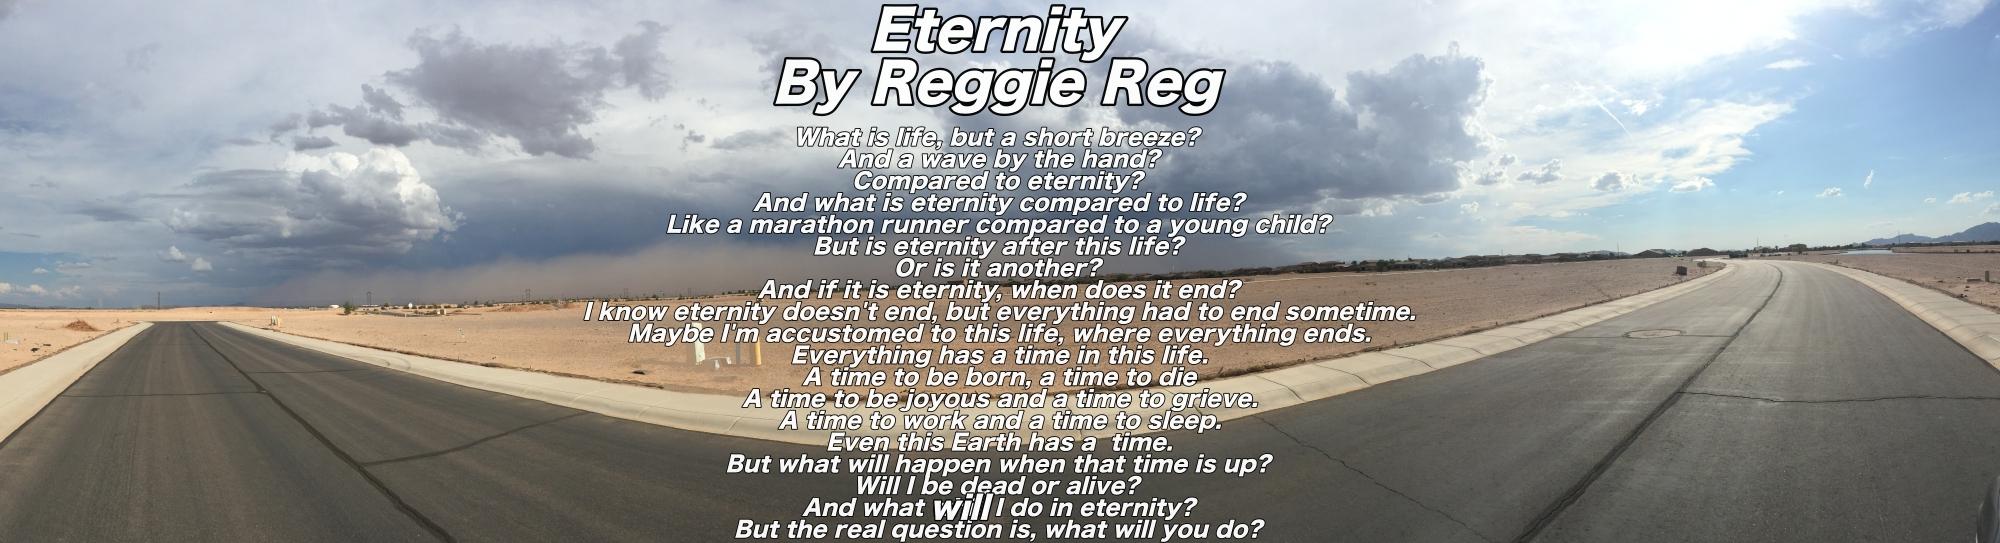 Eternity By Reggie_IMG_4725